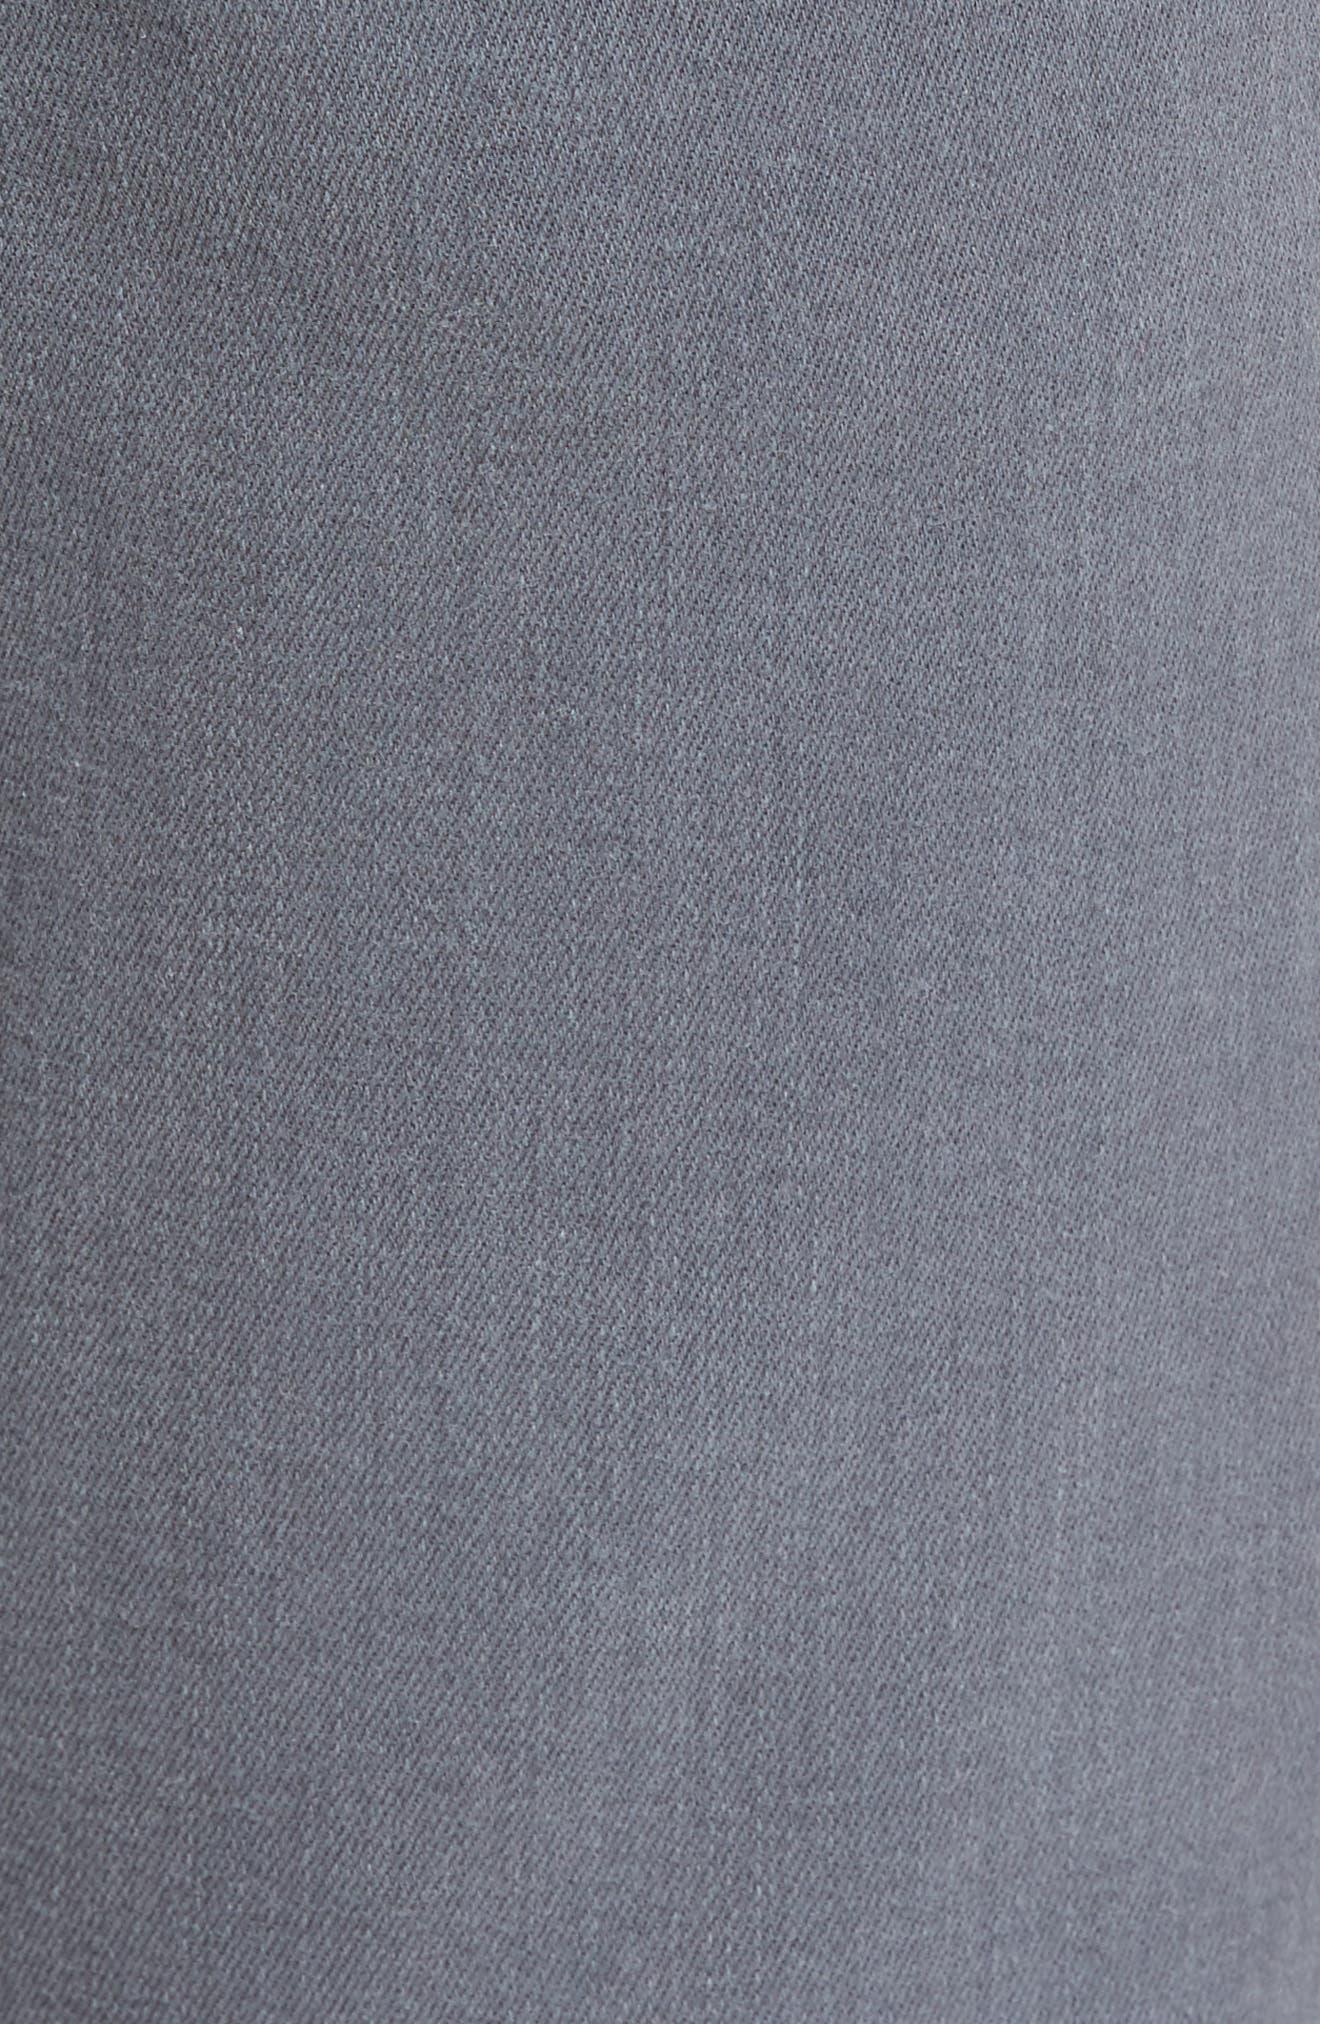 Alternate Image 5  - PAIGE Lennox Slim Fit Jeans (Murray)